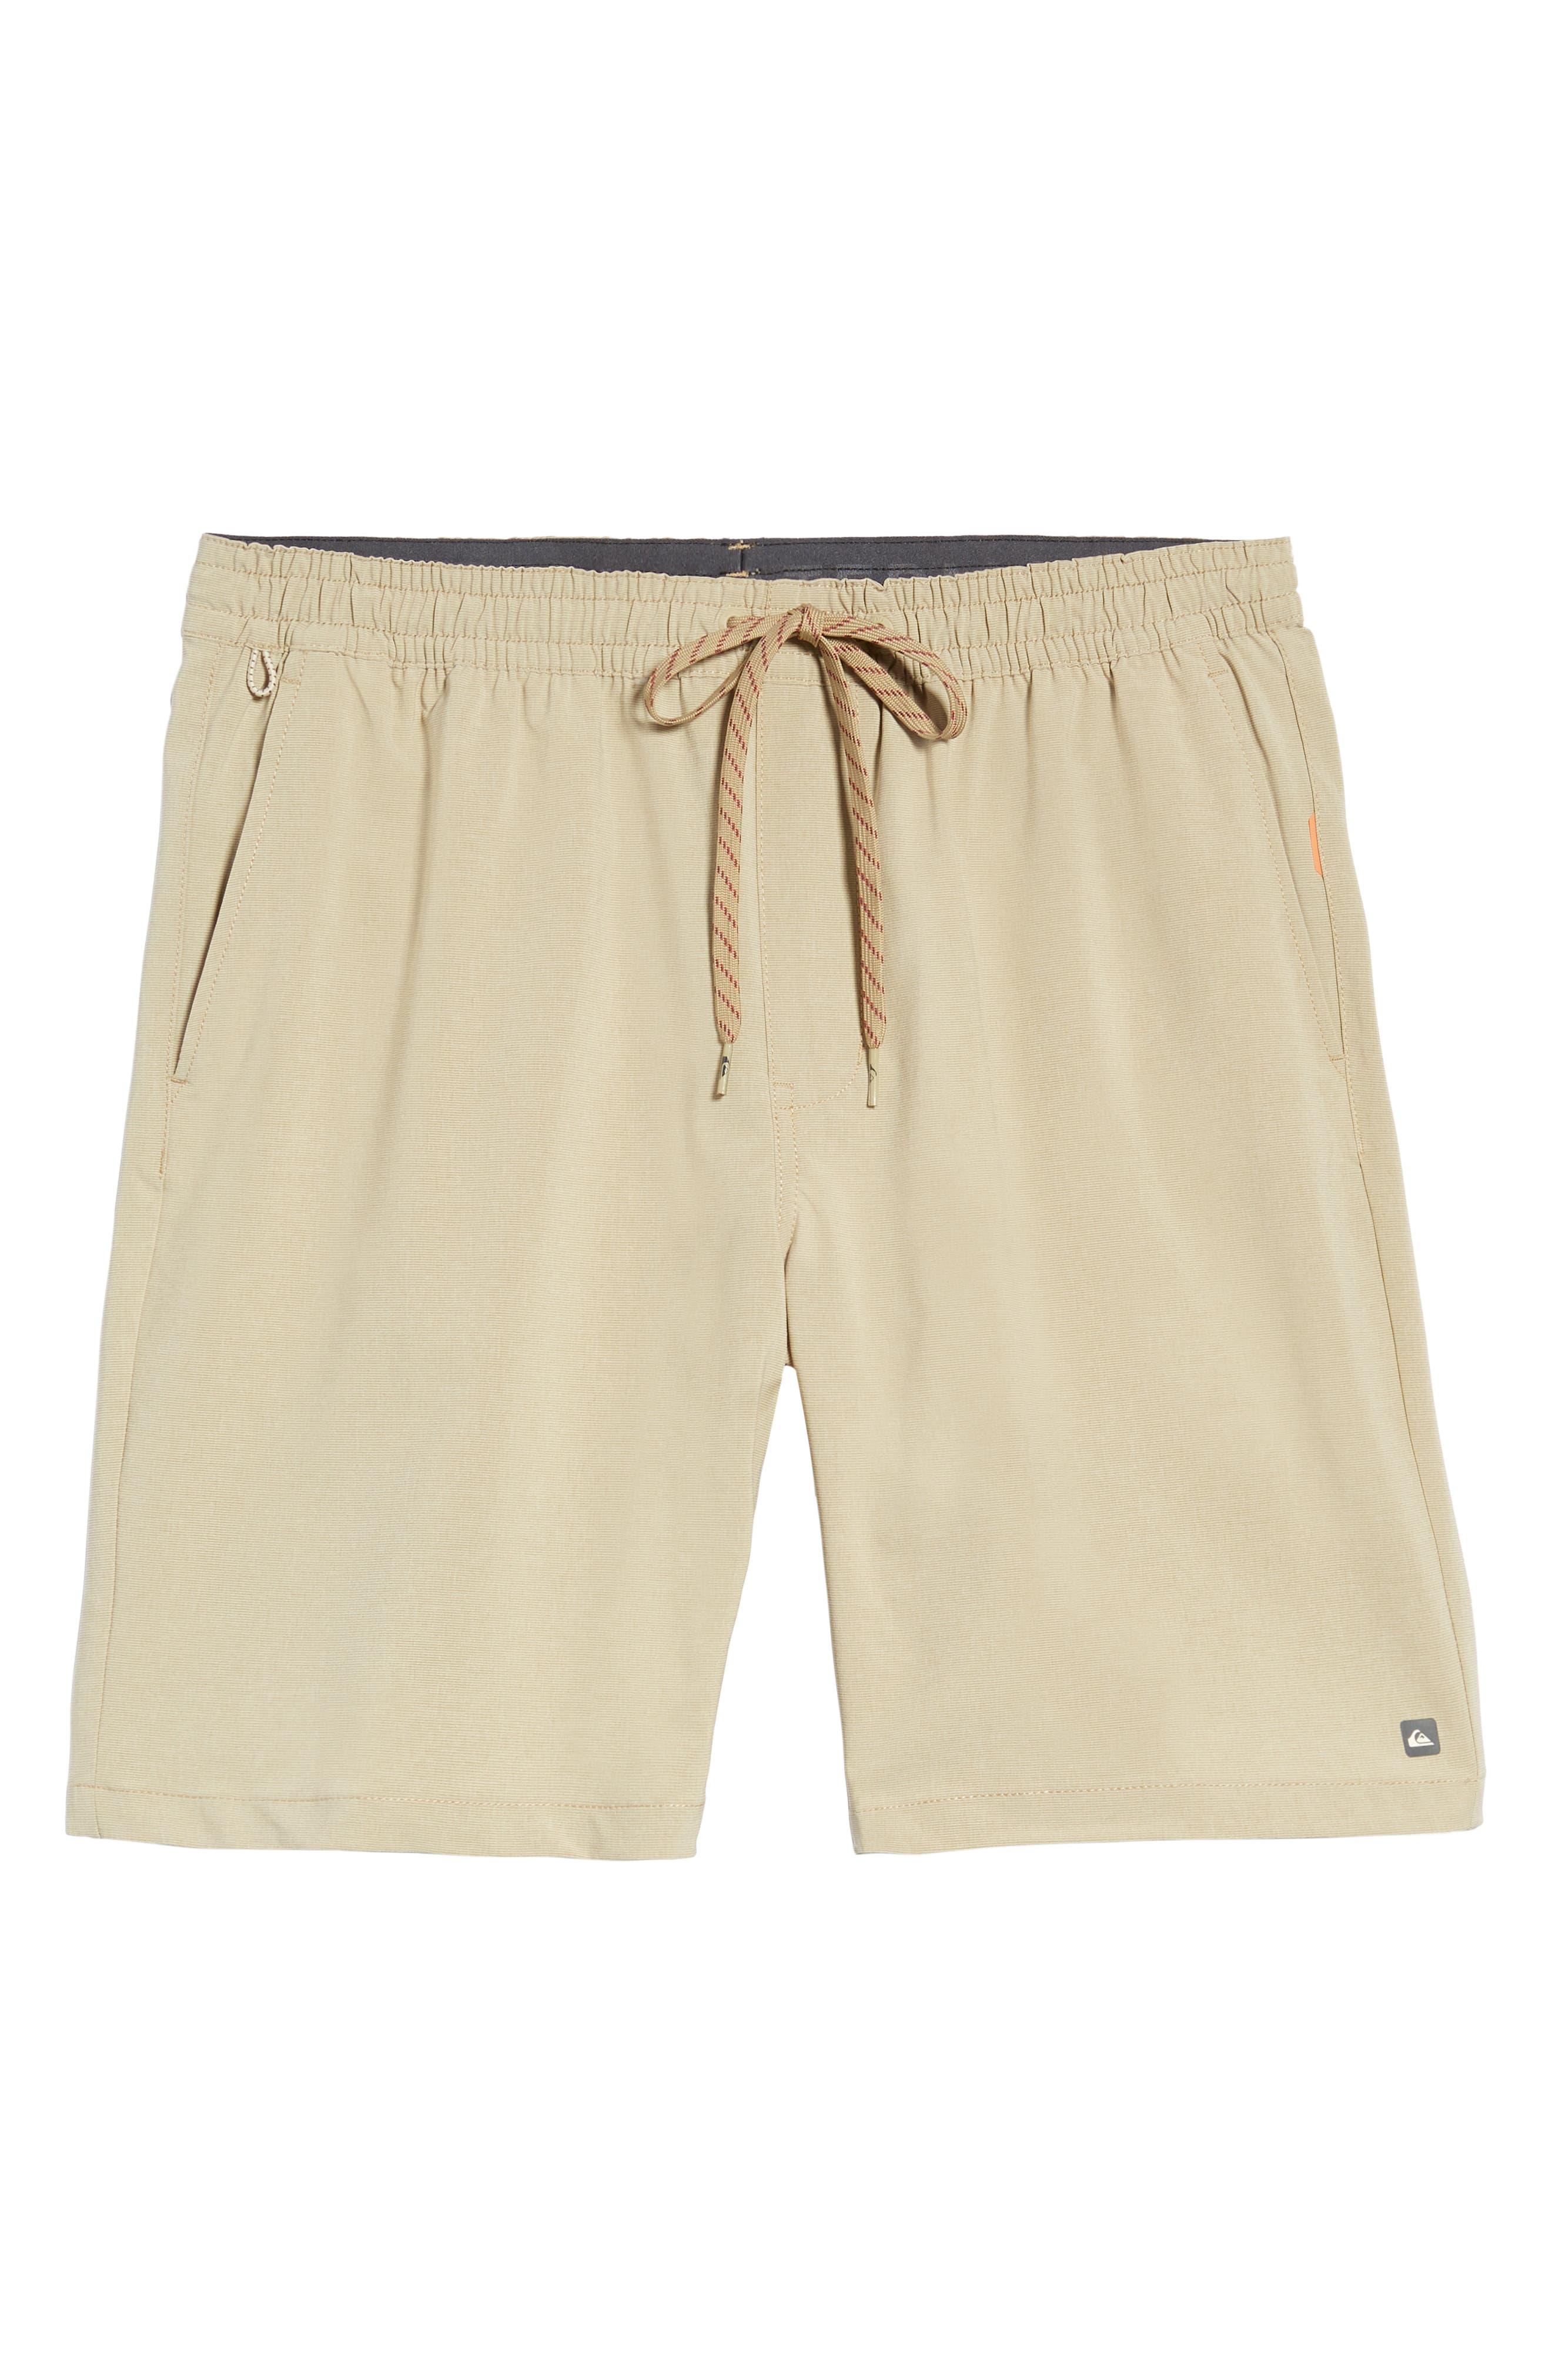 QUIKSILVER WATERMAN COLLECTION,                             Suva Amphibian Hybrid Shorts,                             Alternate thumbnail 6, color,                             TWILL